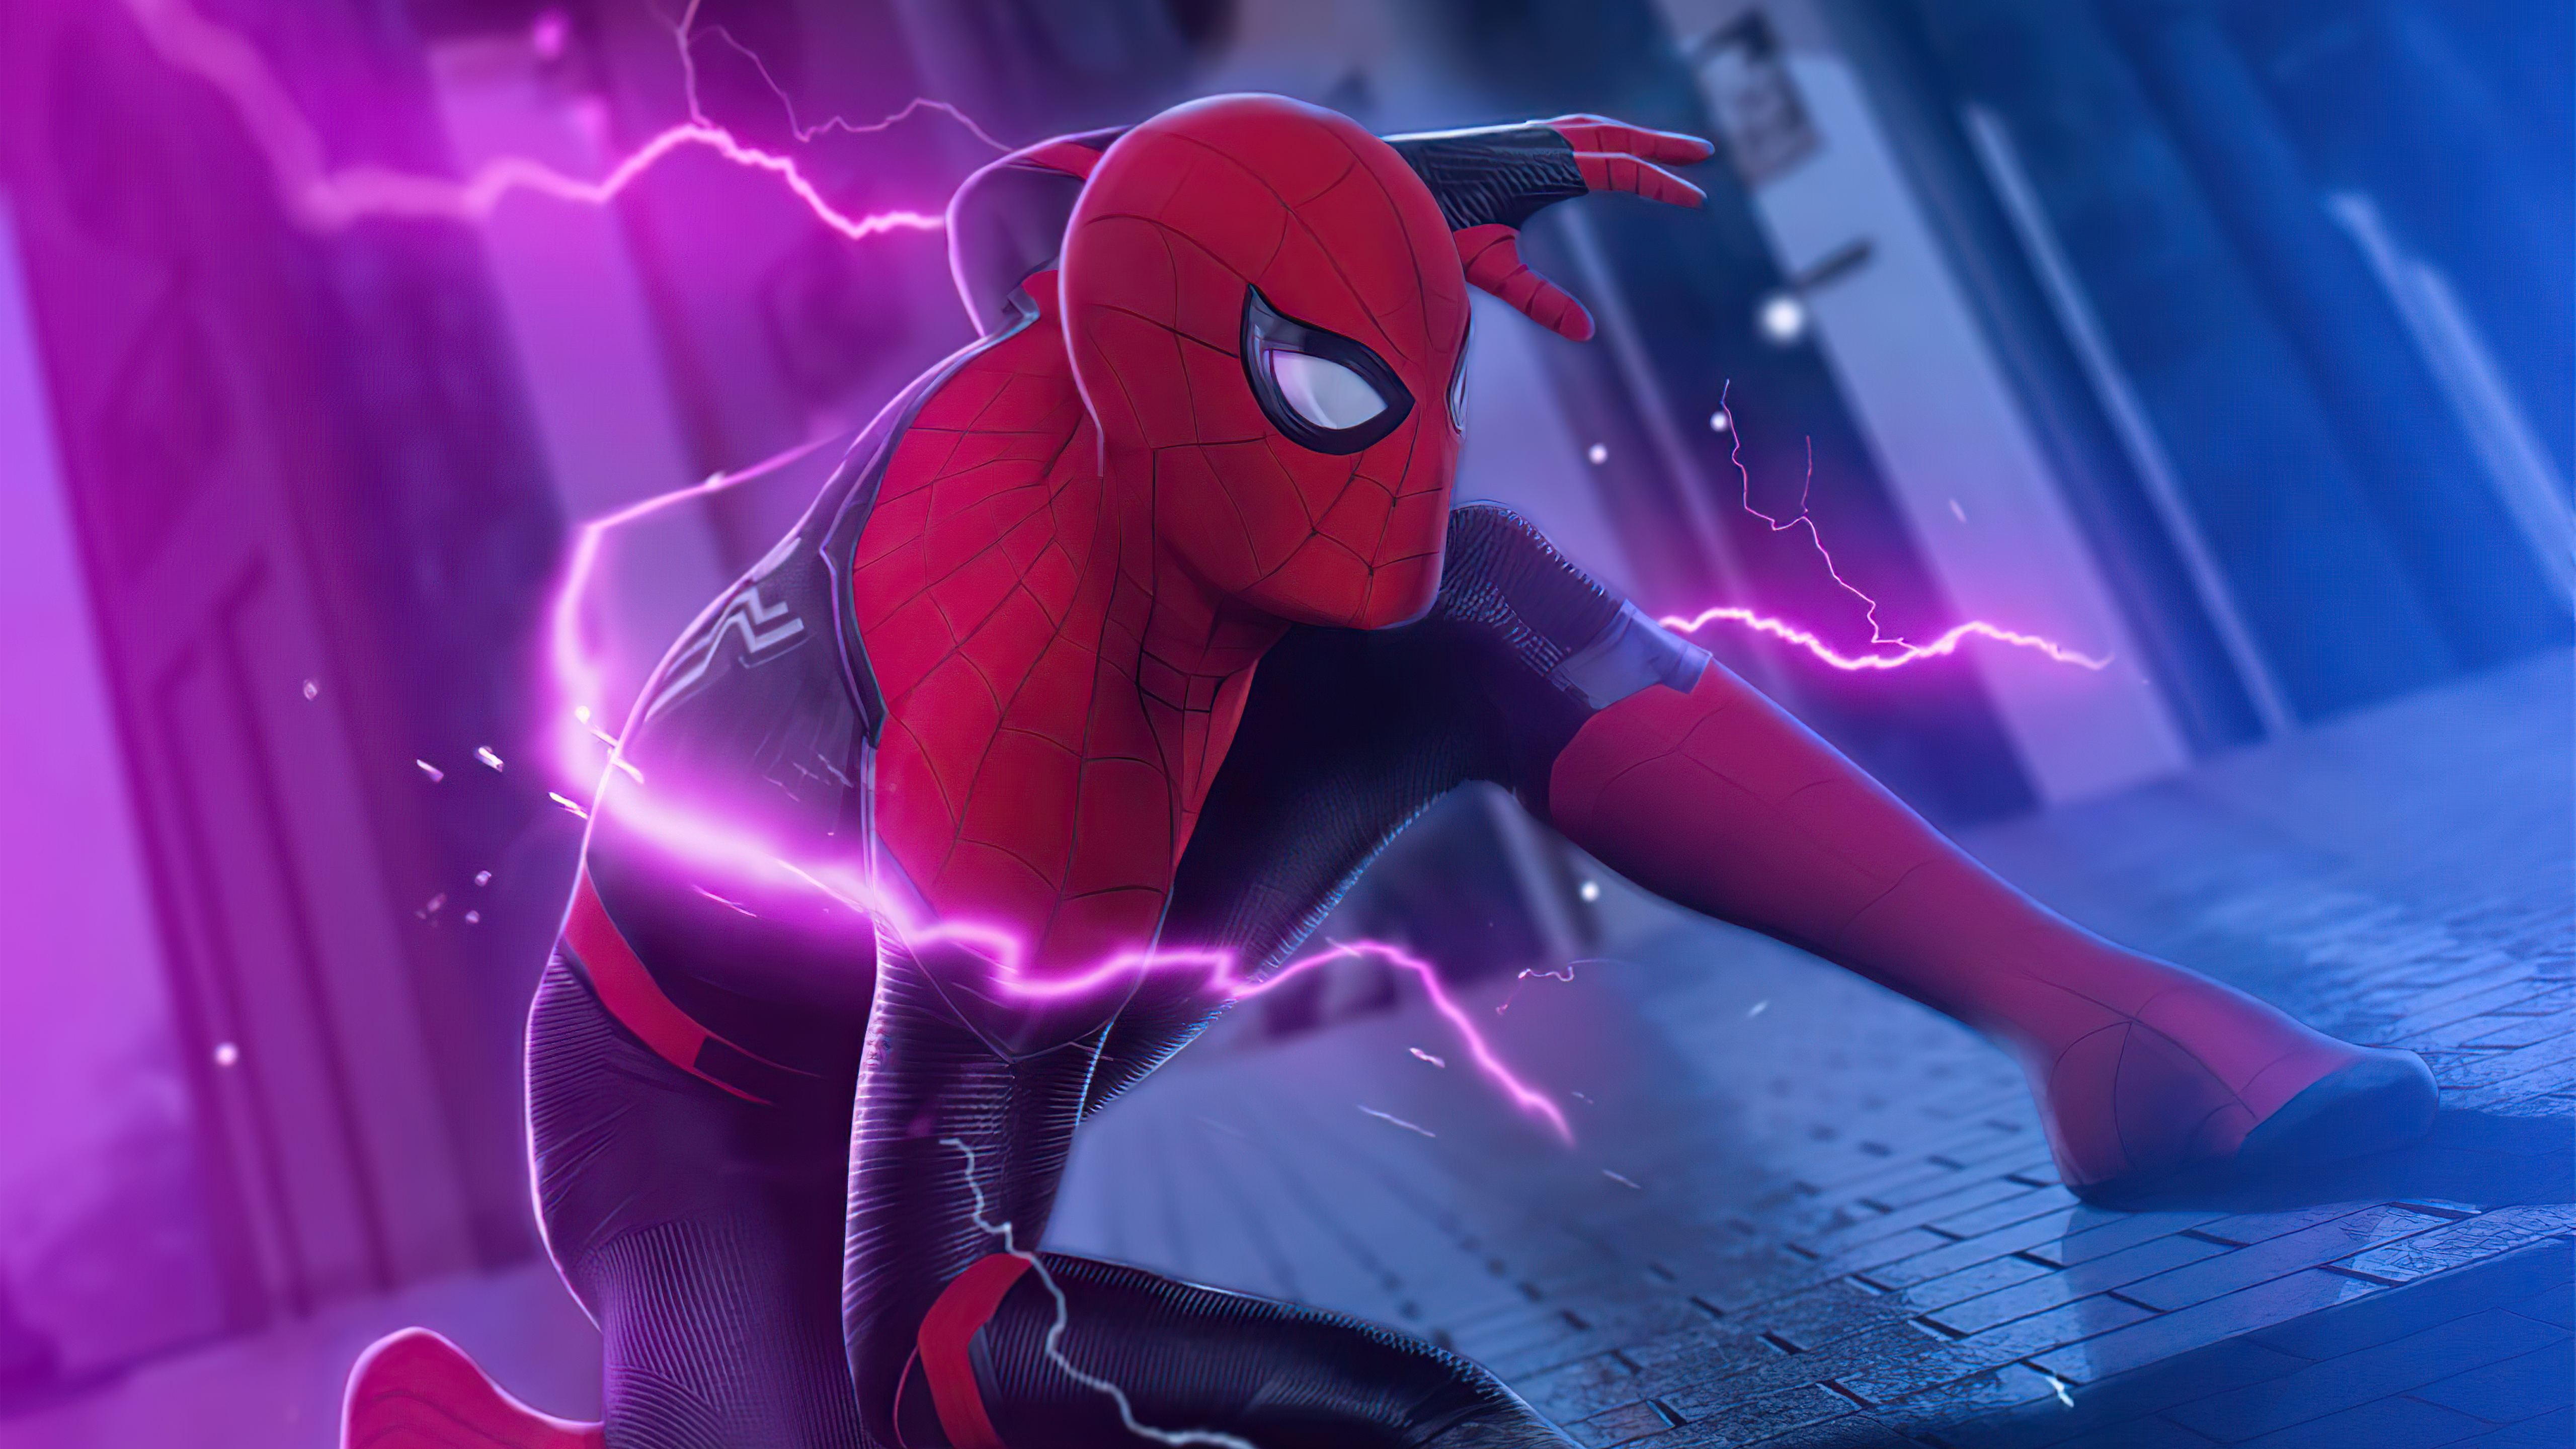 Wallpaper Spider Man Surreal